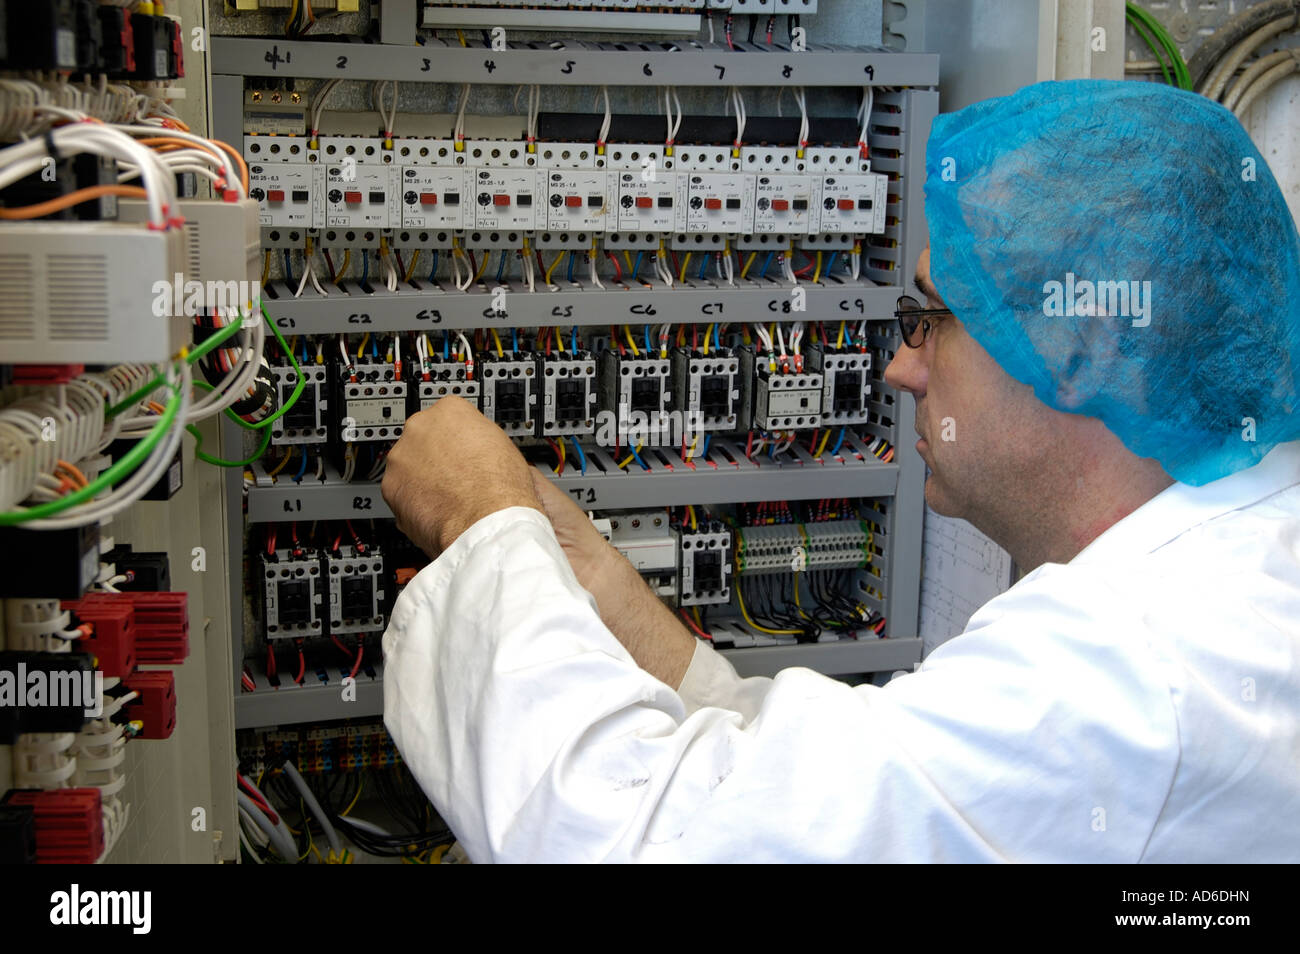 Dangerous Electrical Panel Stock Photos & Dangerous Electrical Panel ...